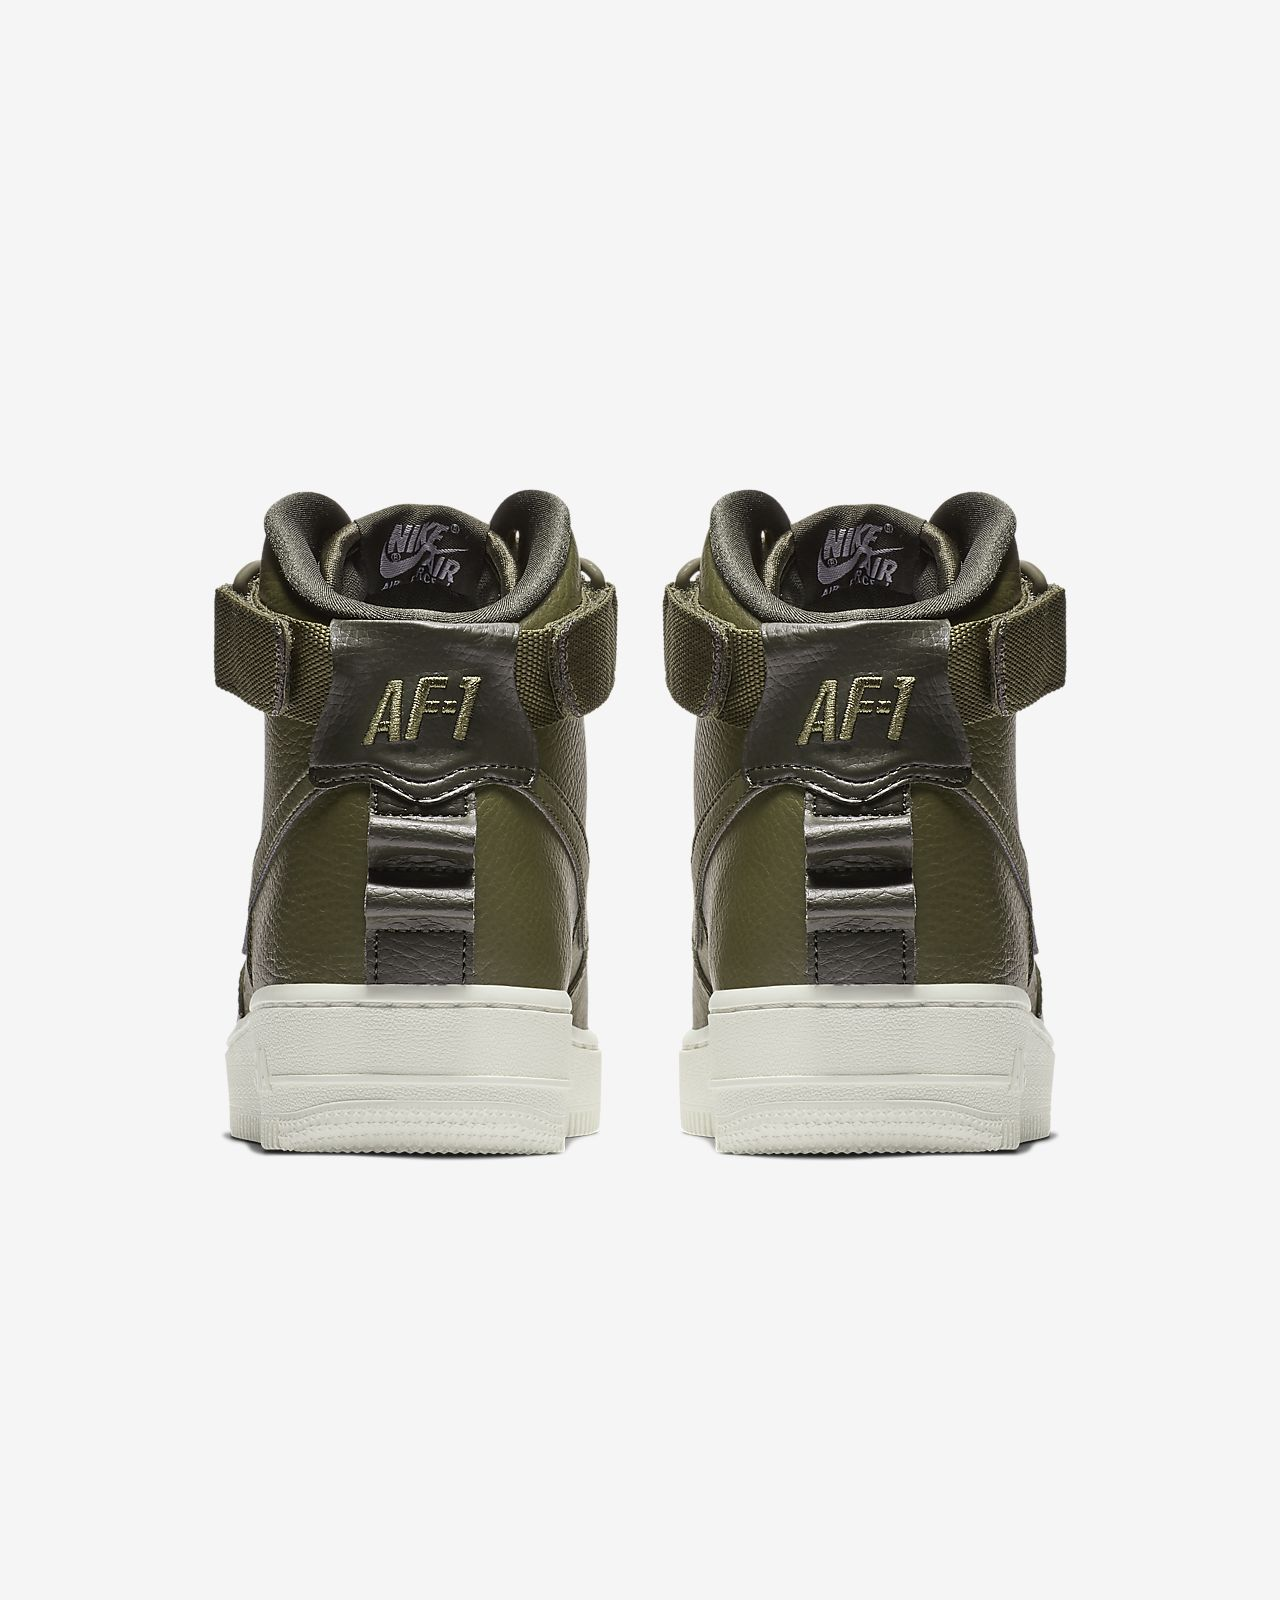 be4cafe170 Sko Nike Air Force 1 High Utility för kvinnor. Nike.com SE